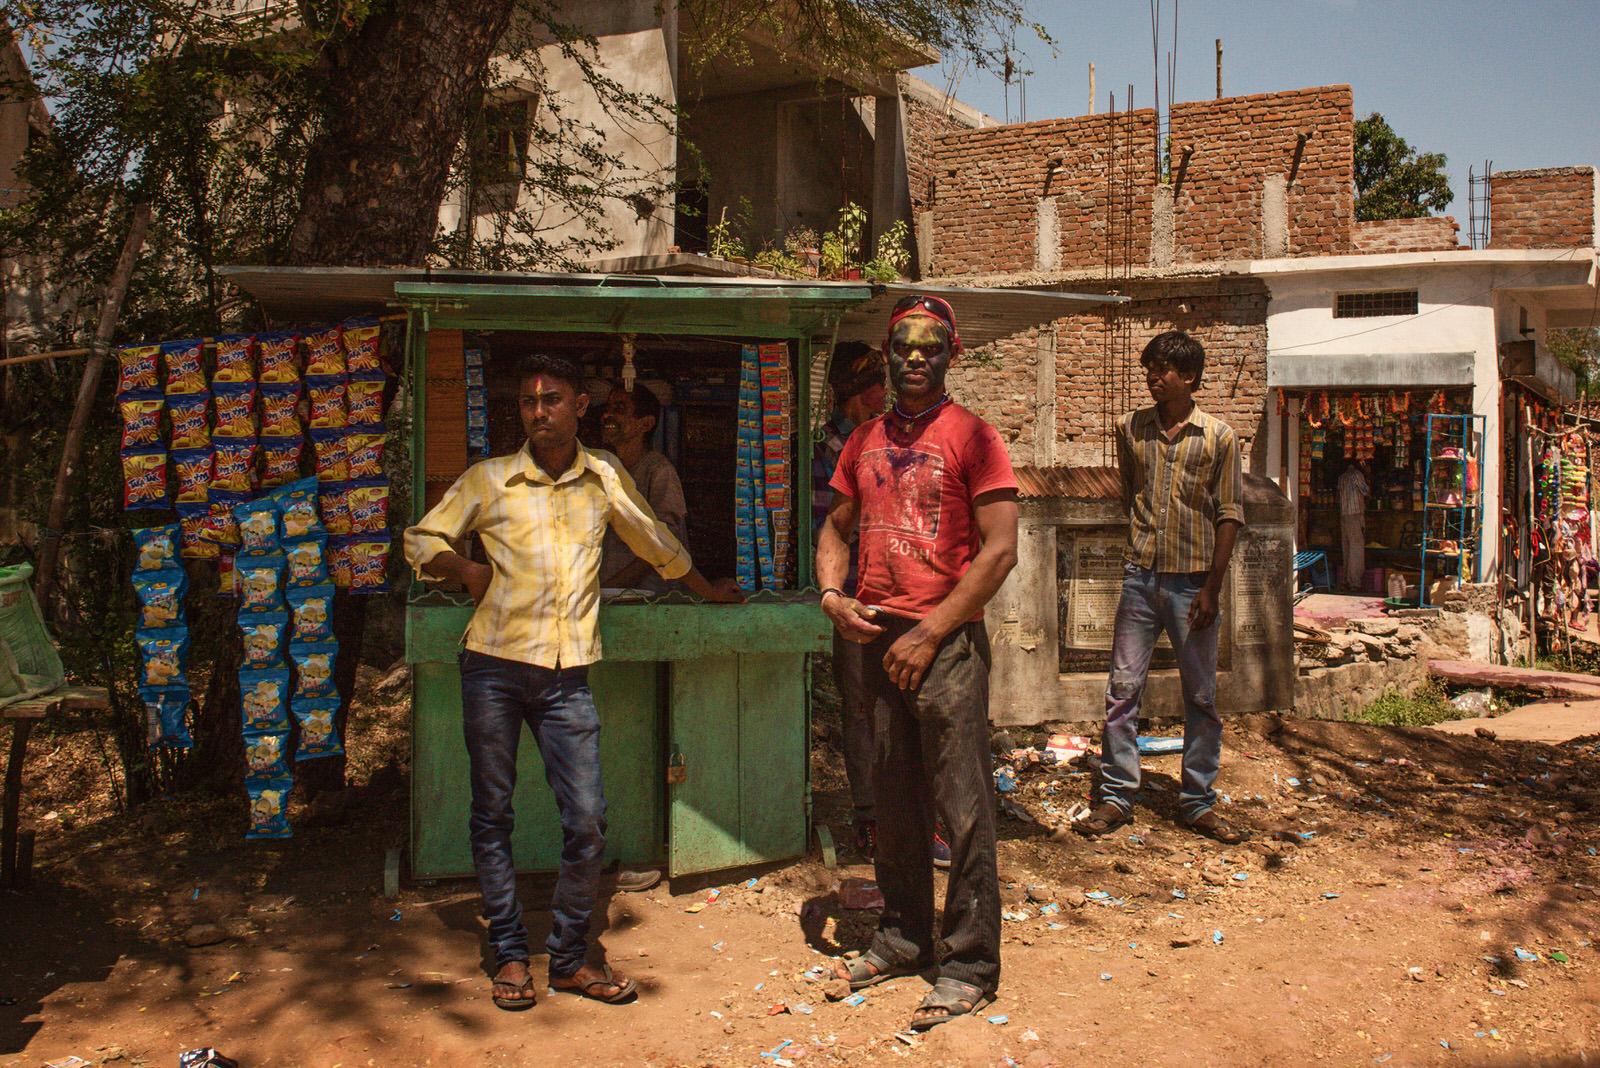 India2016-KathleenHertelPhotography-706.jpg